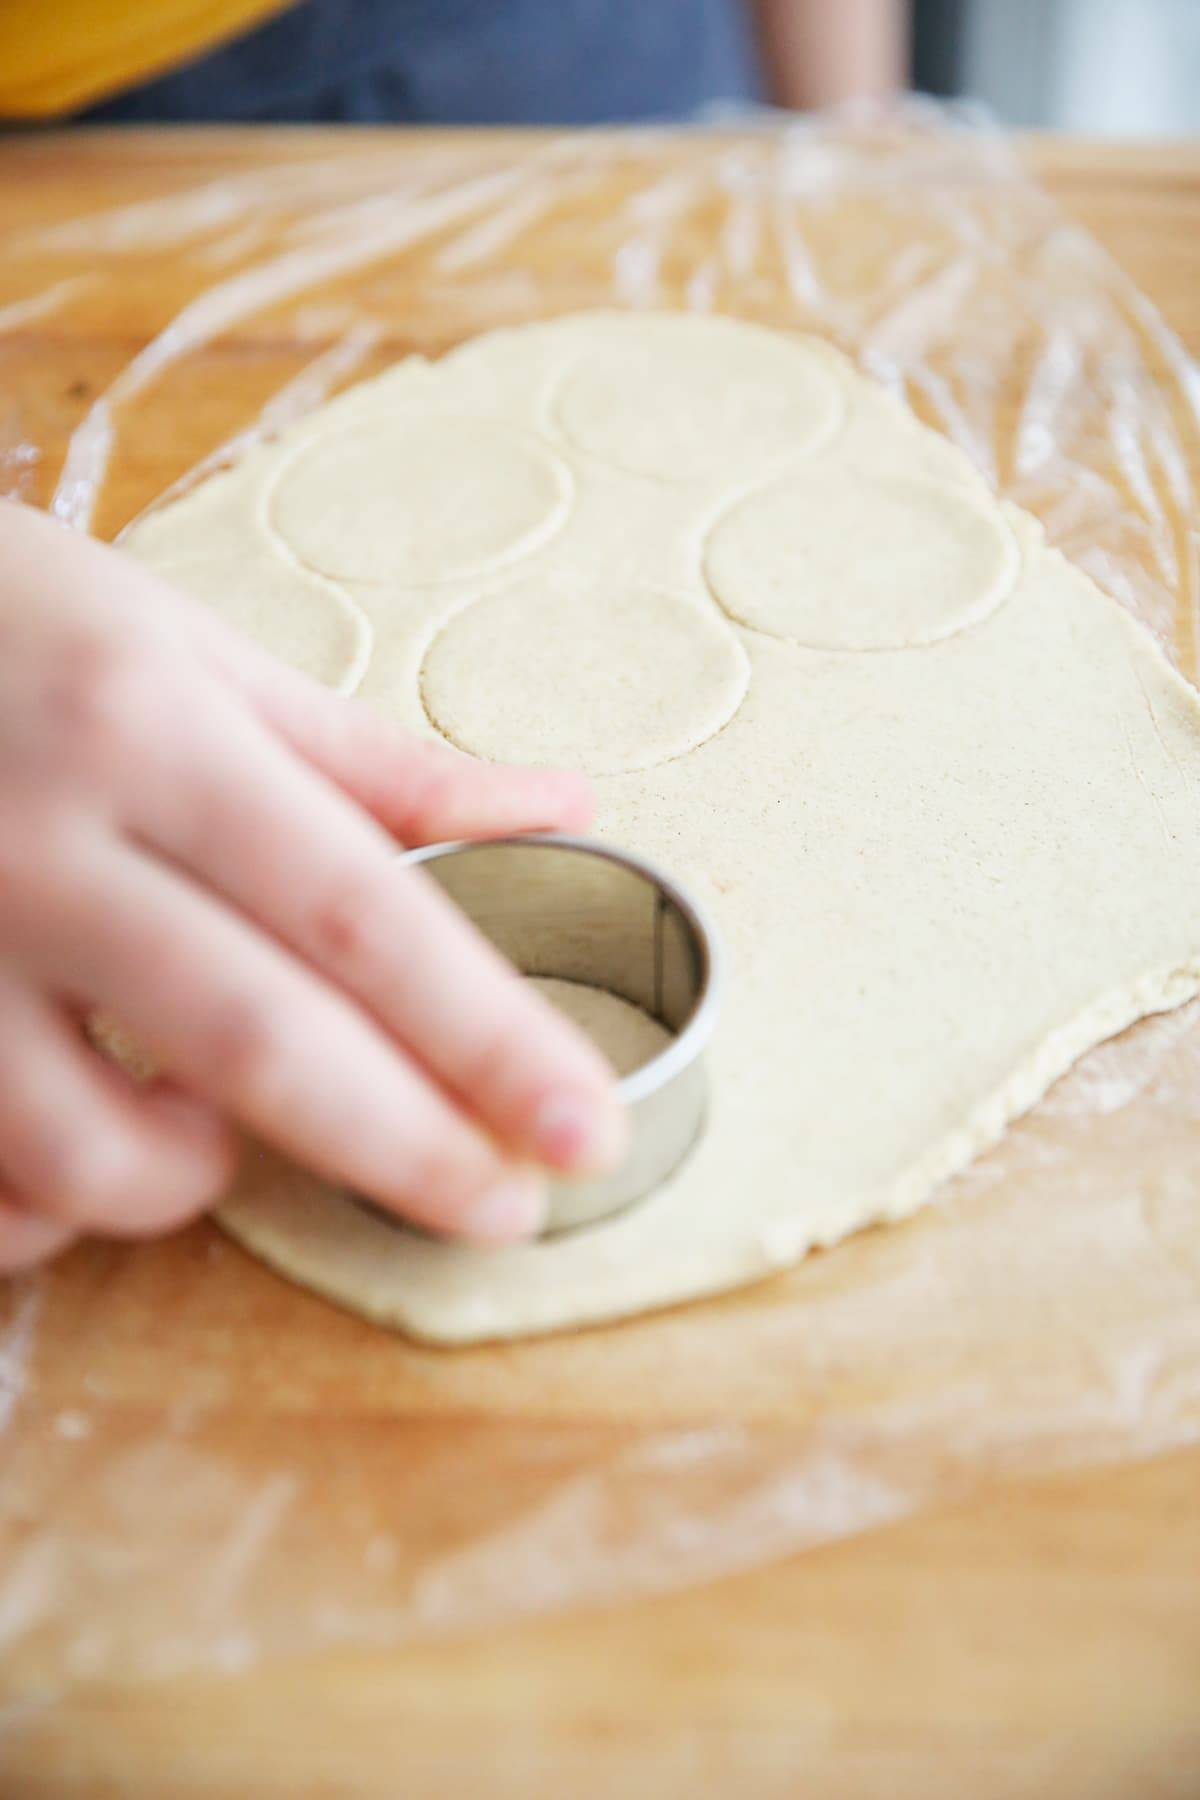 Gluten free pigs in a blanket dough